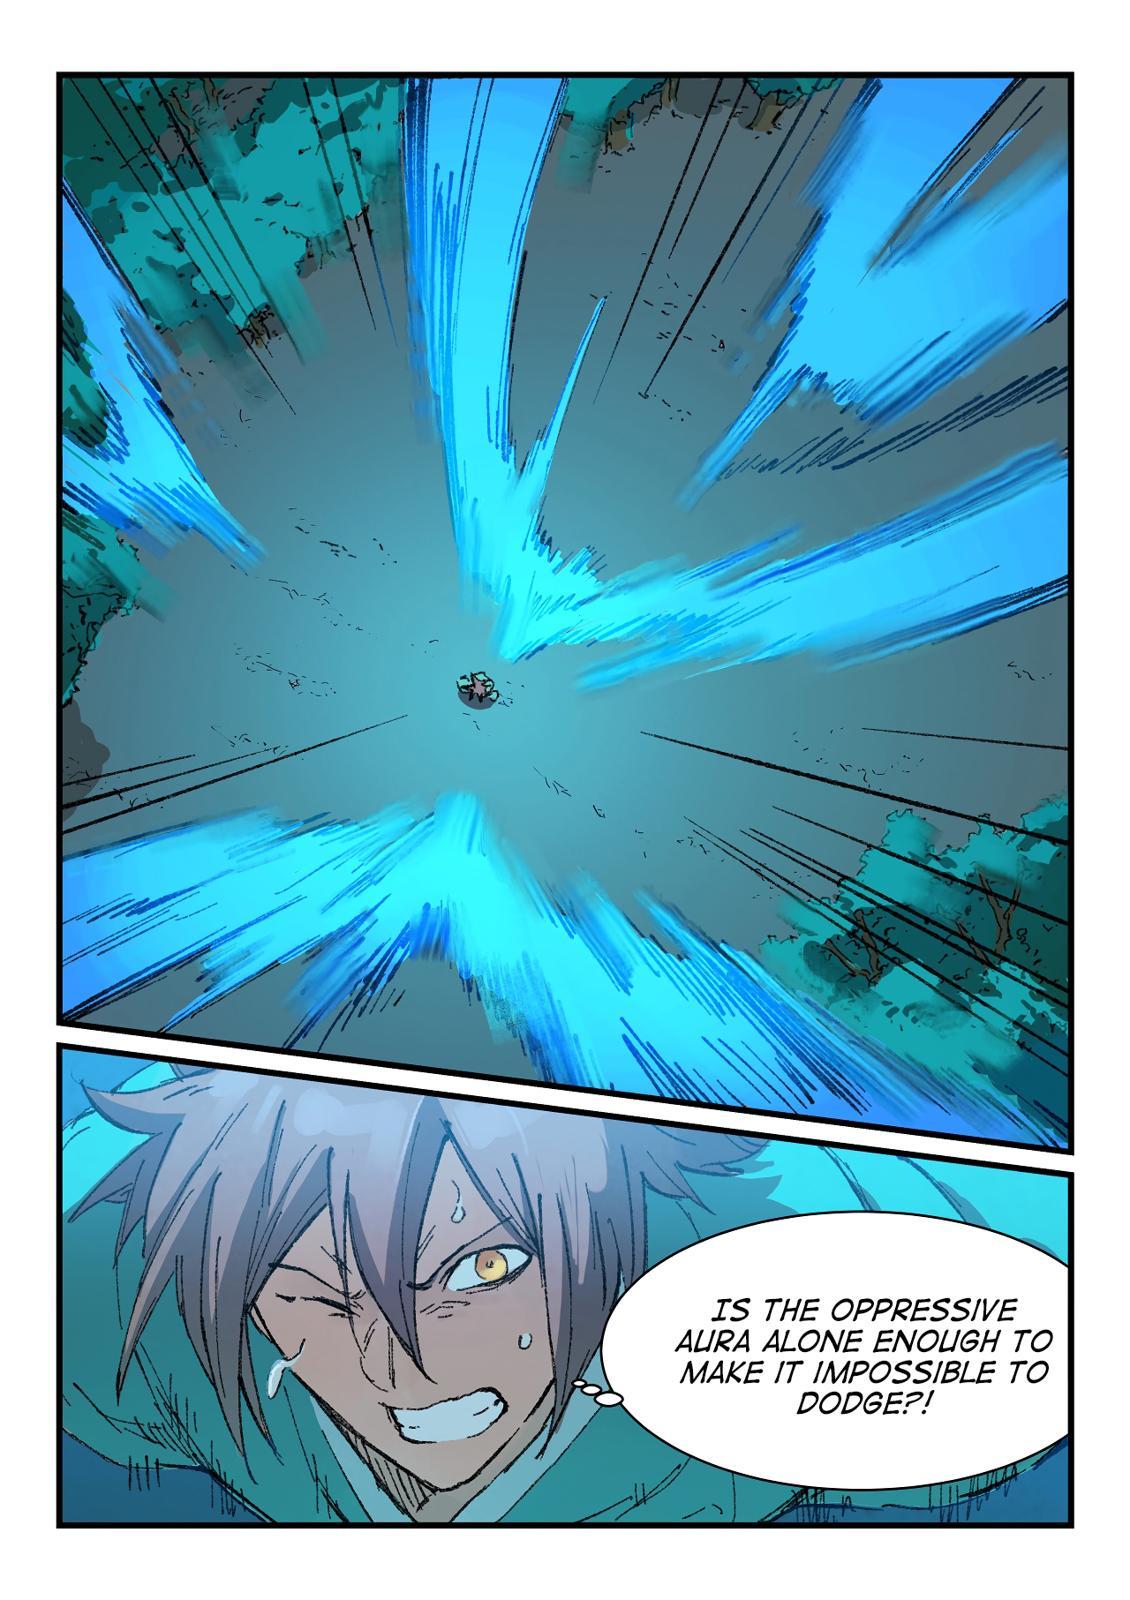 https://manga.mangadogs.com/comics/pic4/10/11210/1758314/8399caac6d7e6240600ace476e2c83e7.jpg Page 1